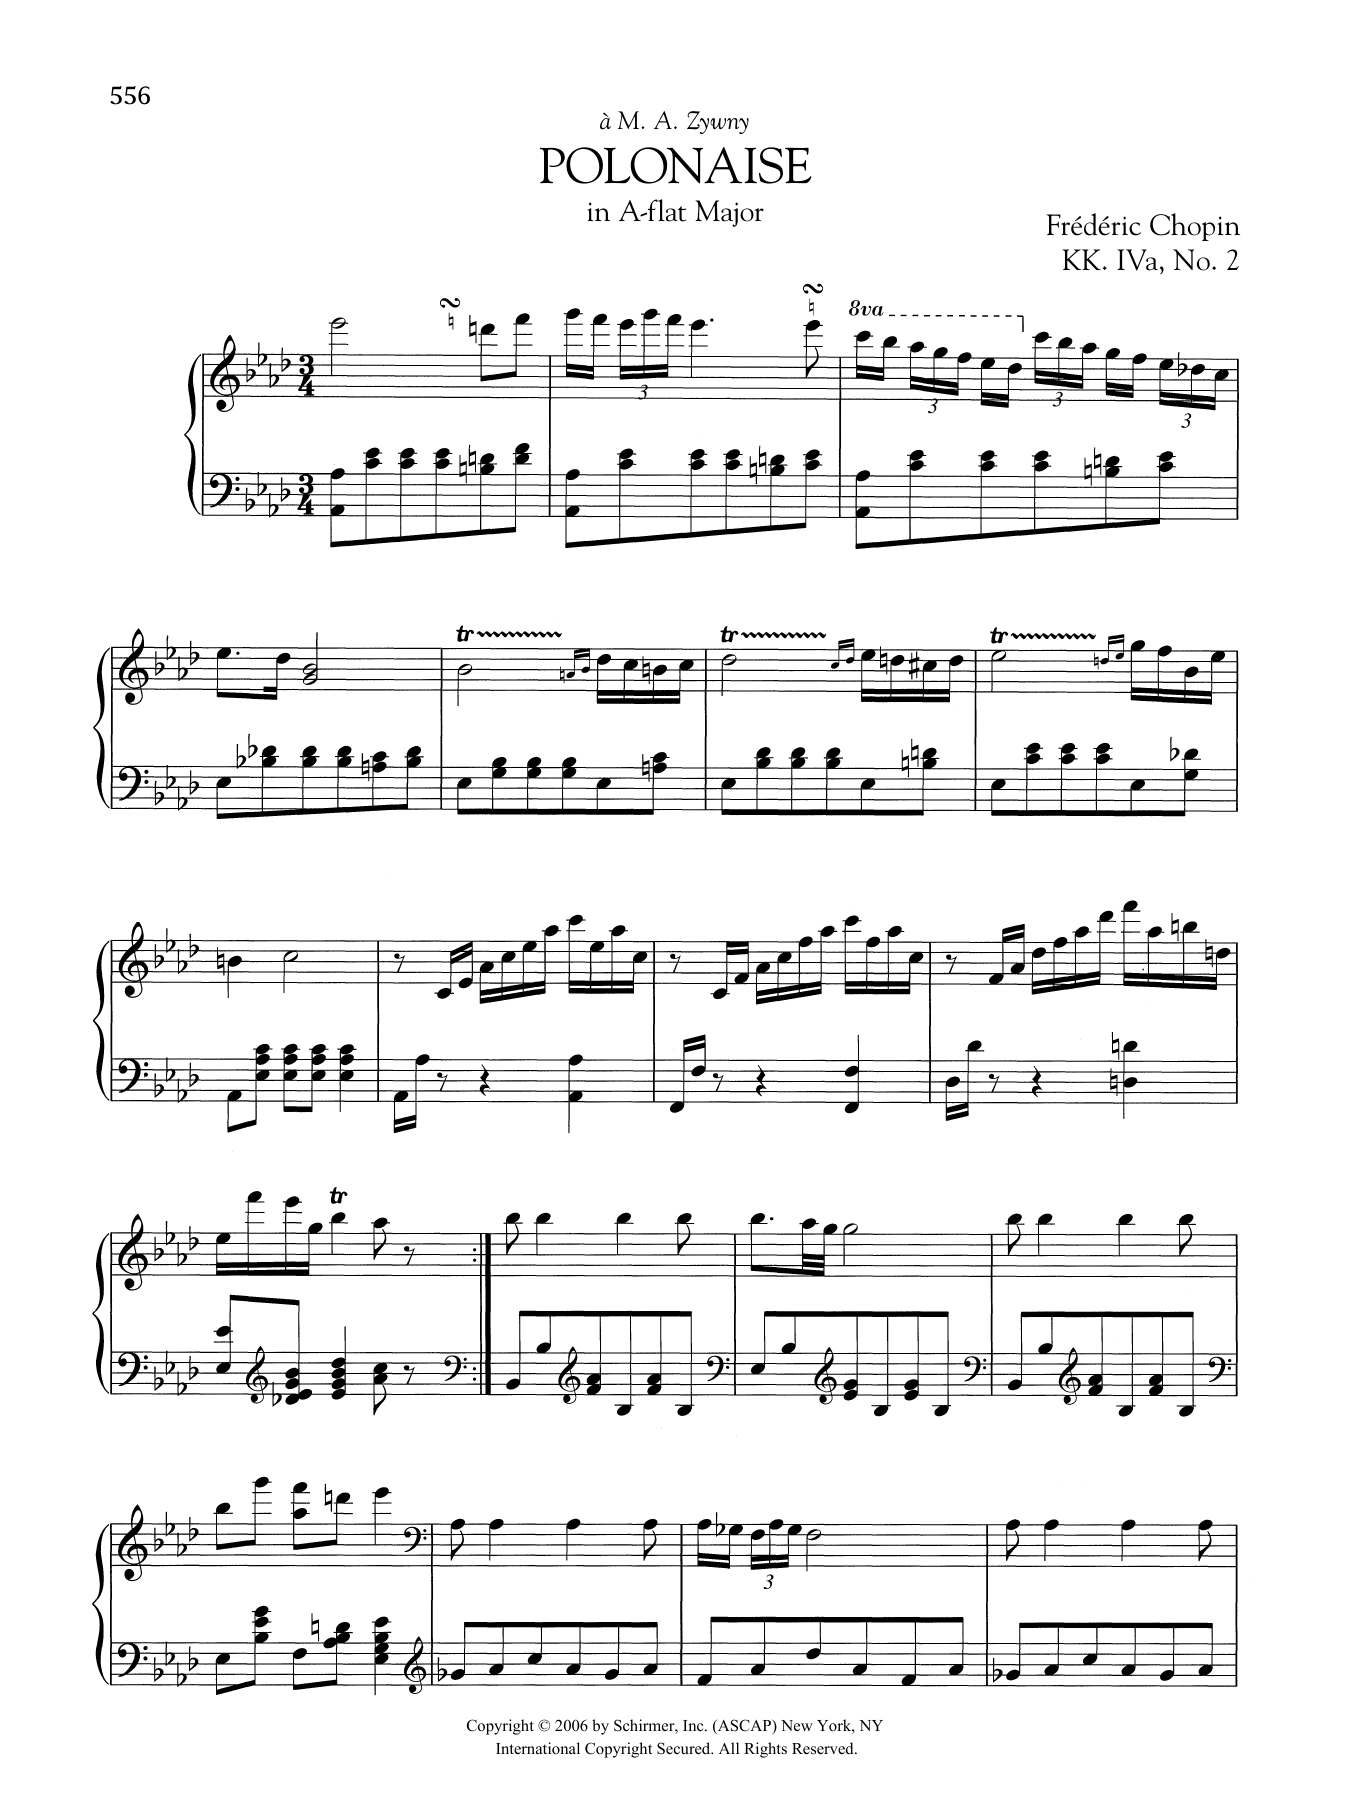 Polonaise in A-flat Major, KK. IVa, No. 2 Sheet Music